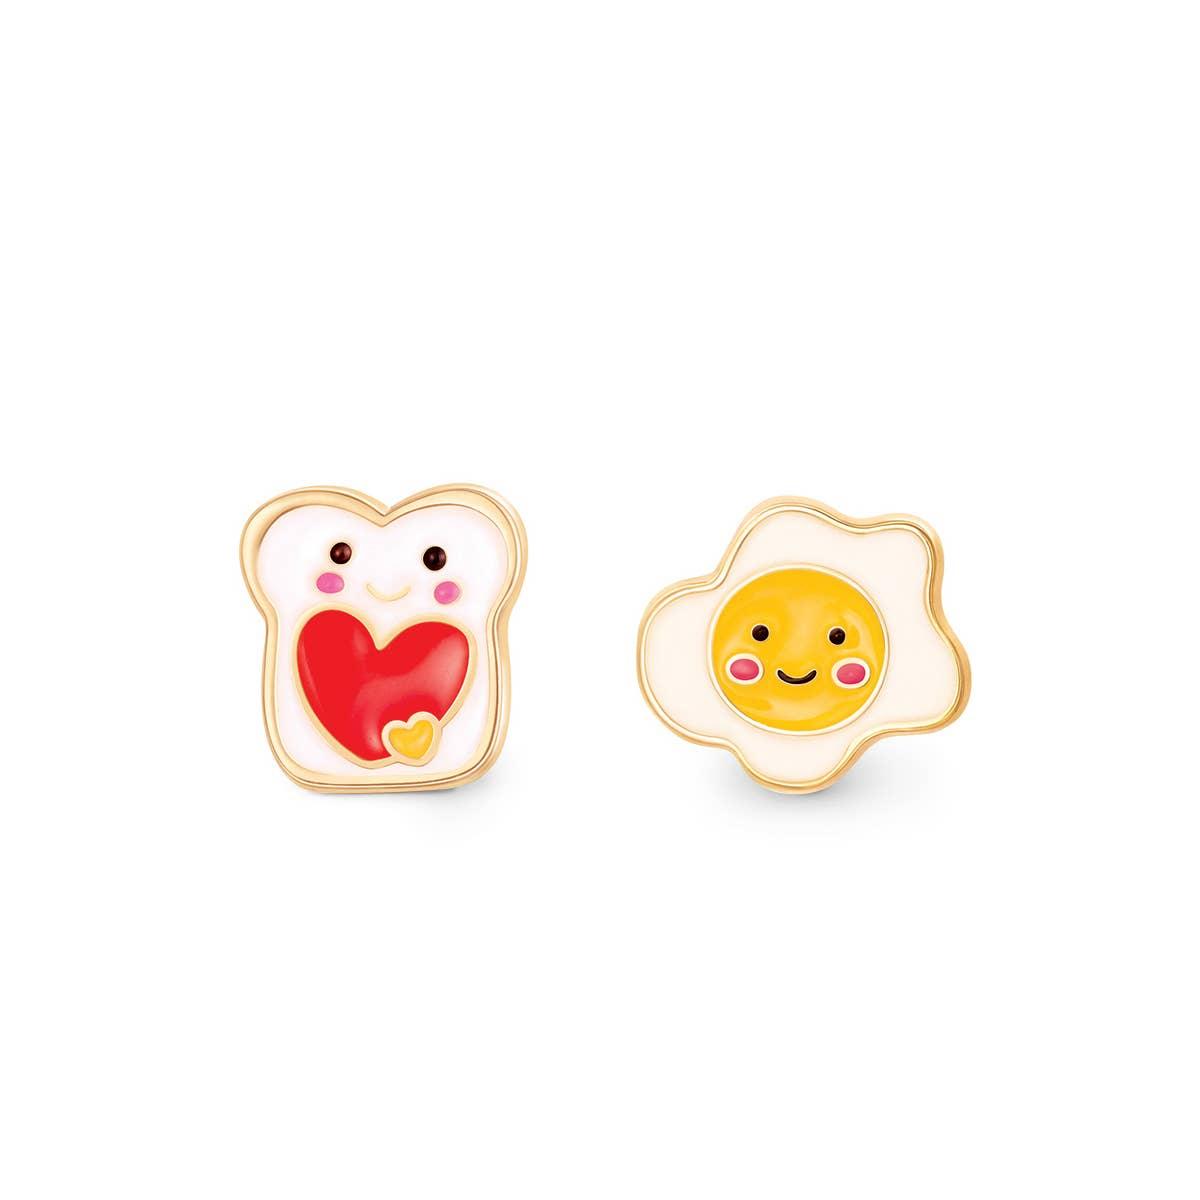 """The Perfect Pair""- Breakfast Favs Cutie Studs   Trada Marketplace"